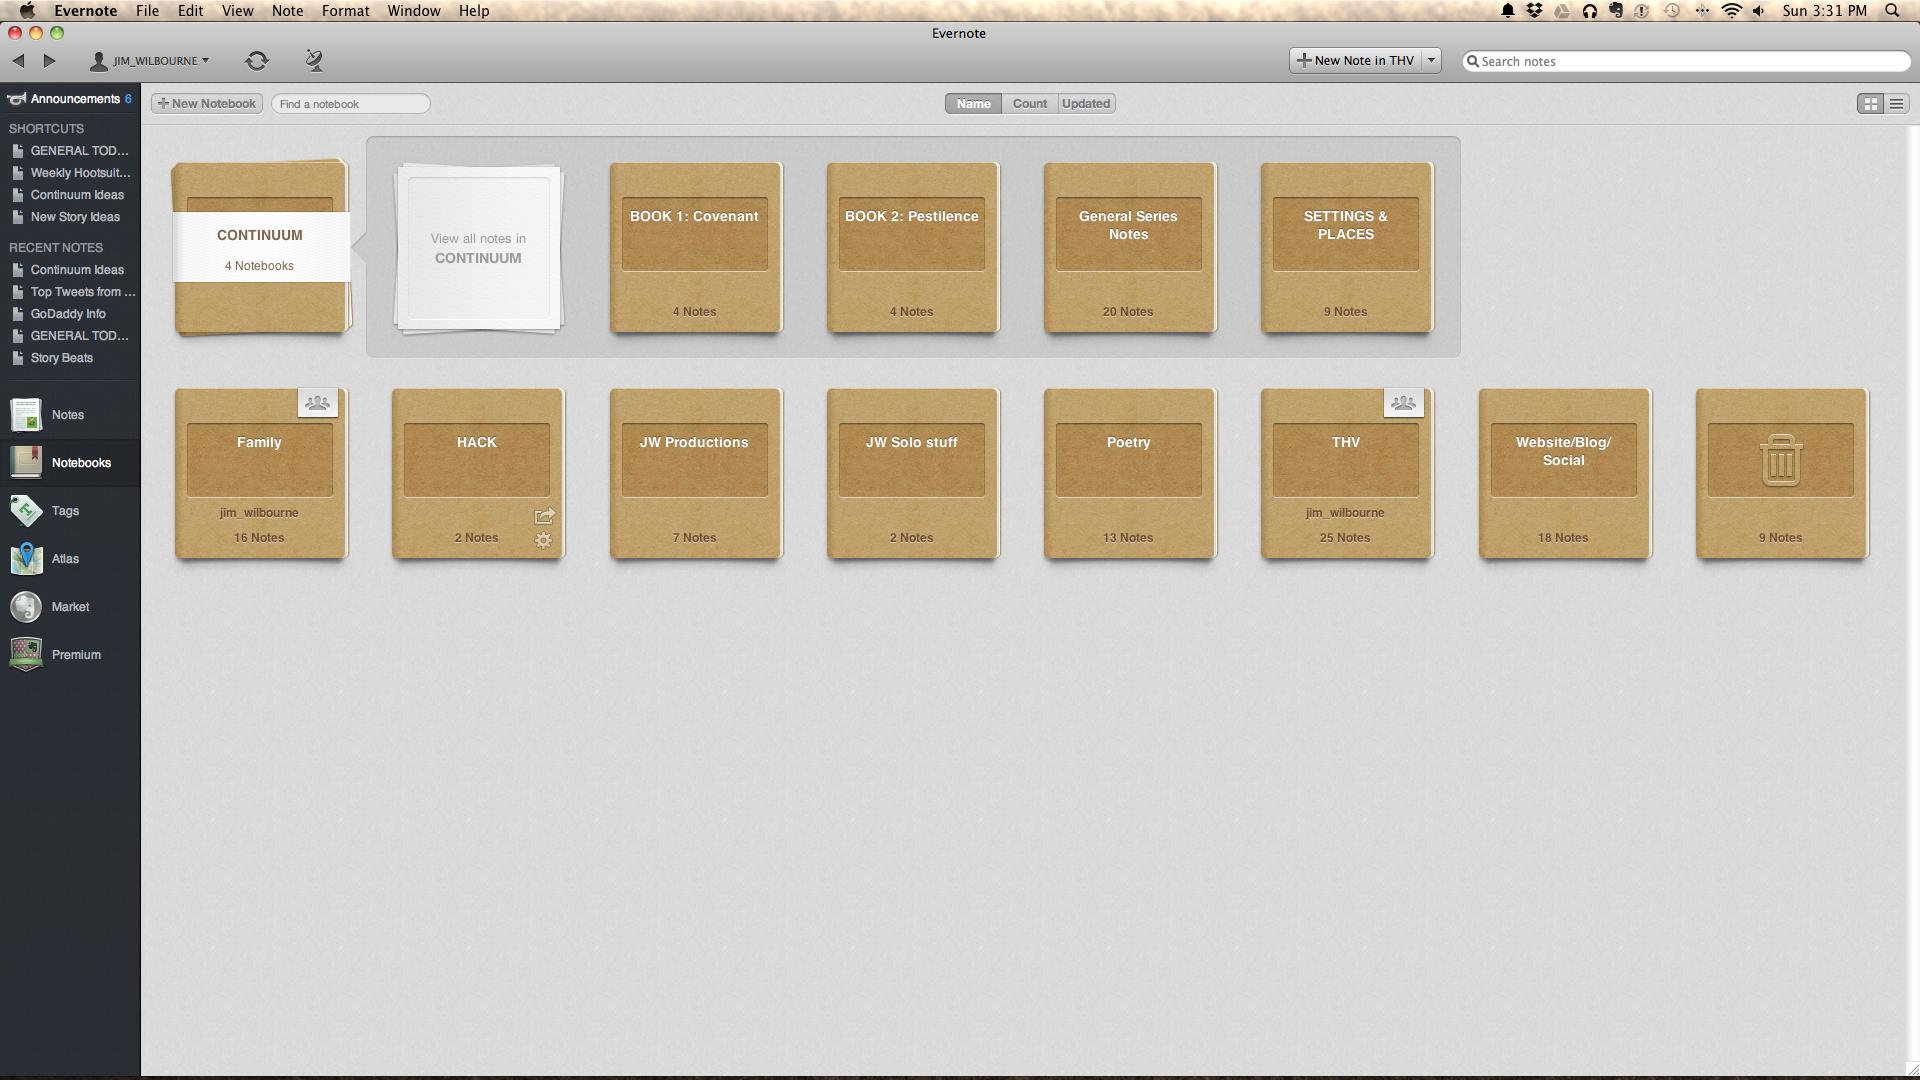 My Evernote Desktop App